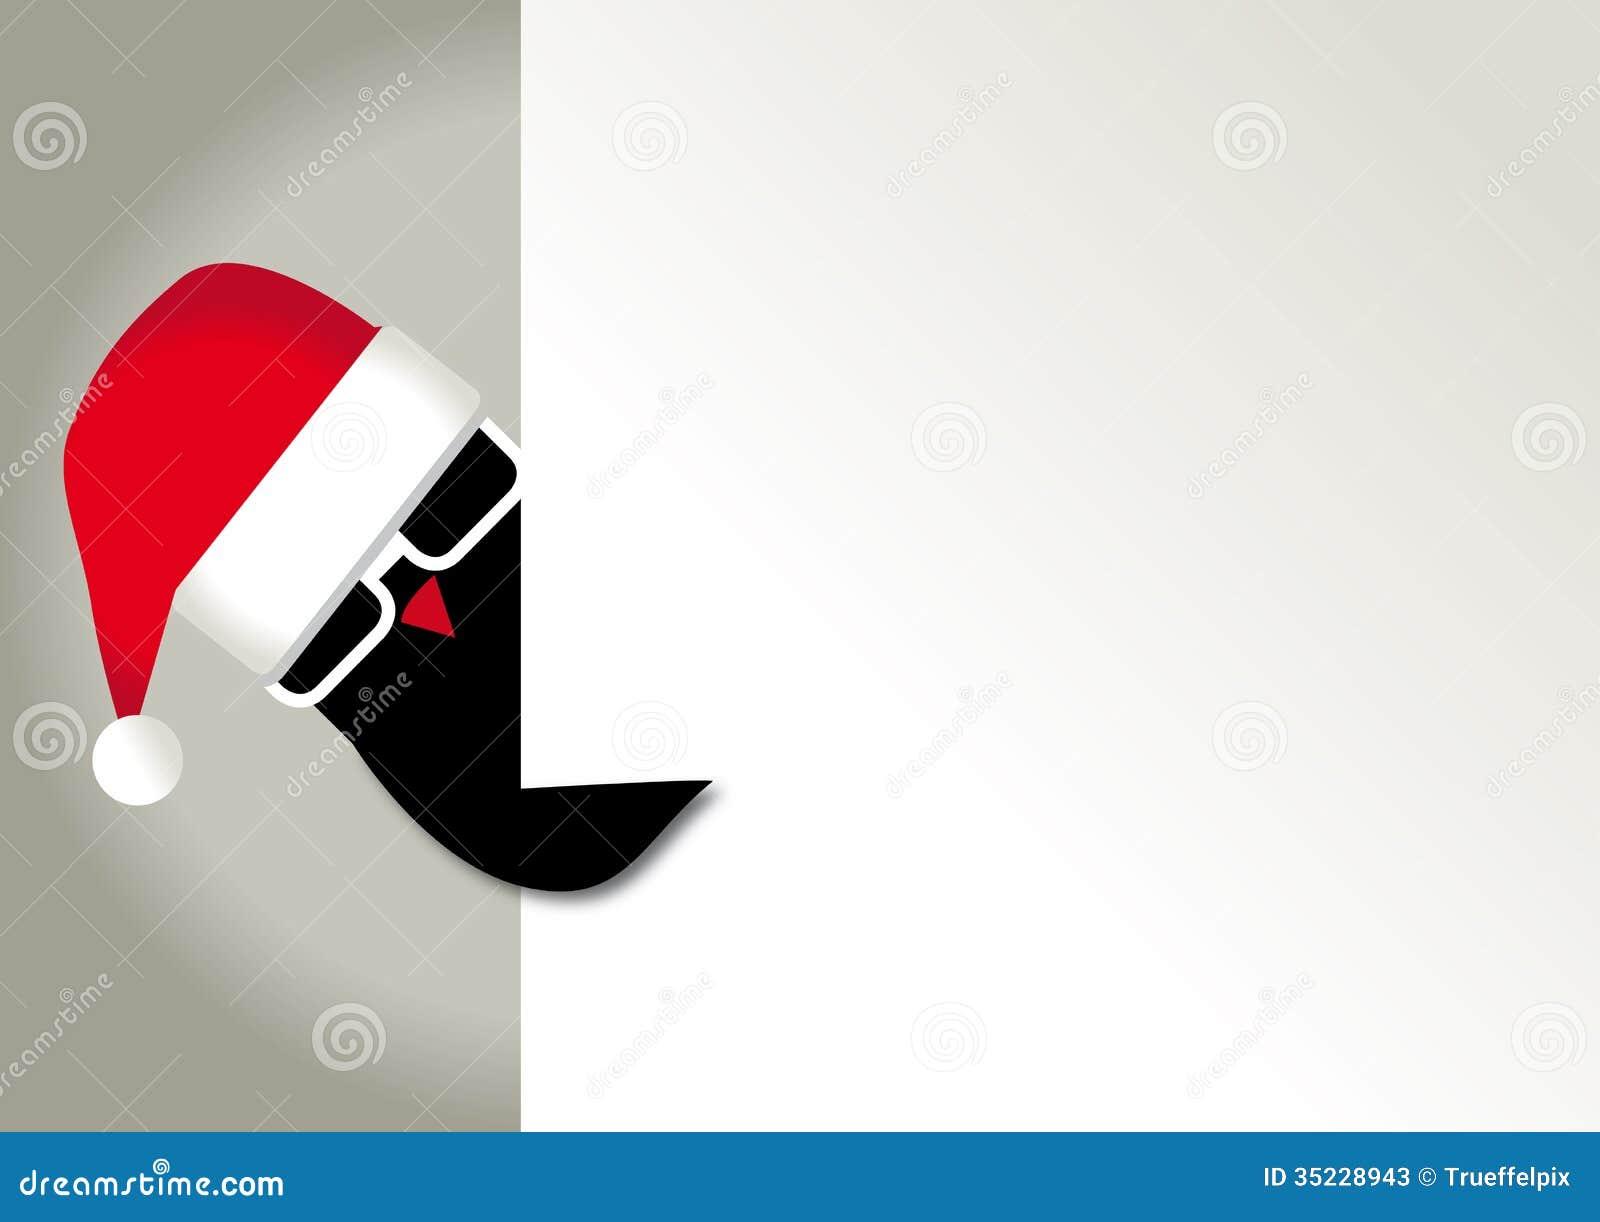 Christmas Gift Vouchers Templates 10 Chrsitmas Gift Vouchers – Christmas Gift Vouchers Templates